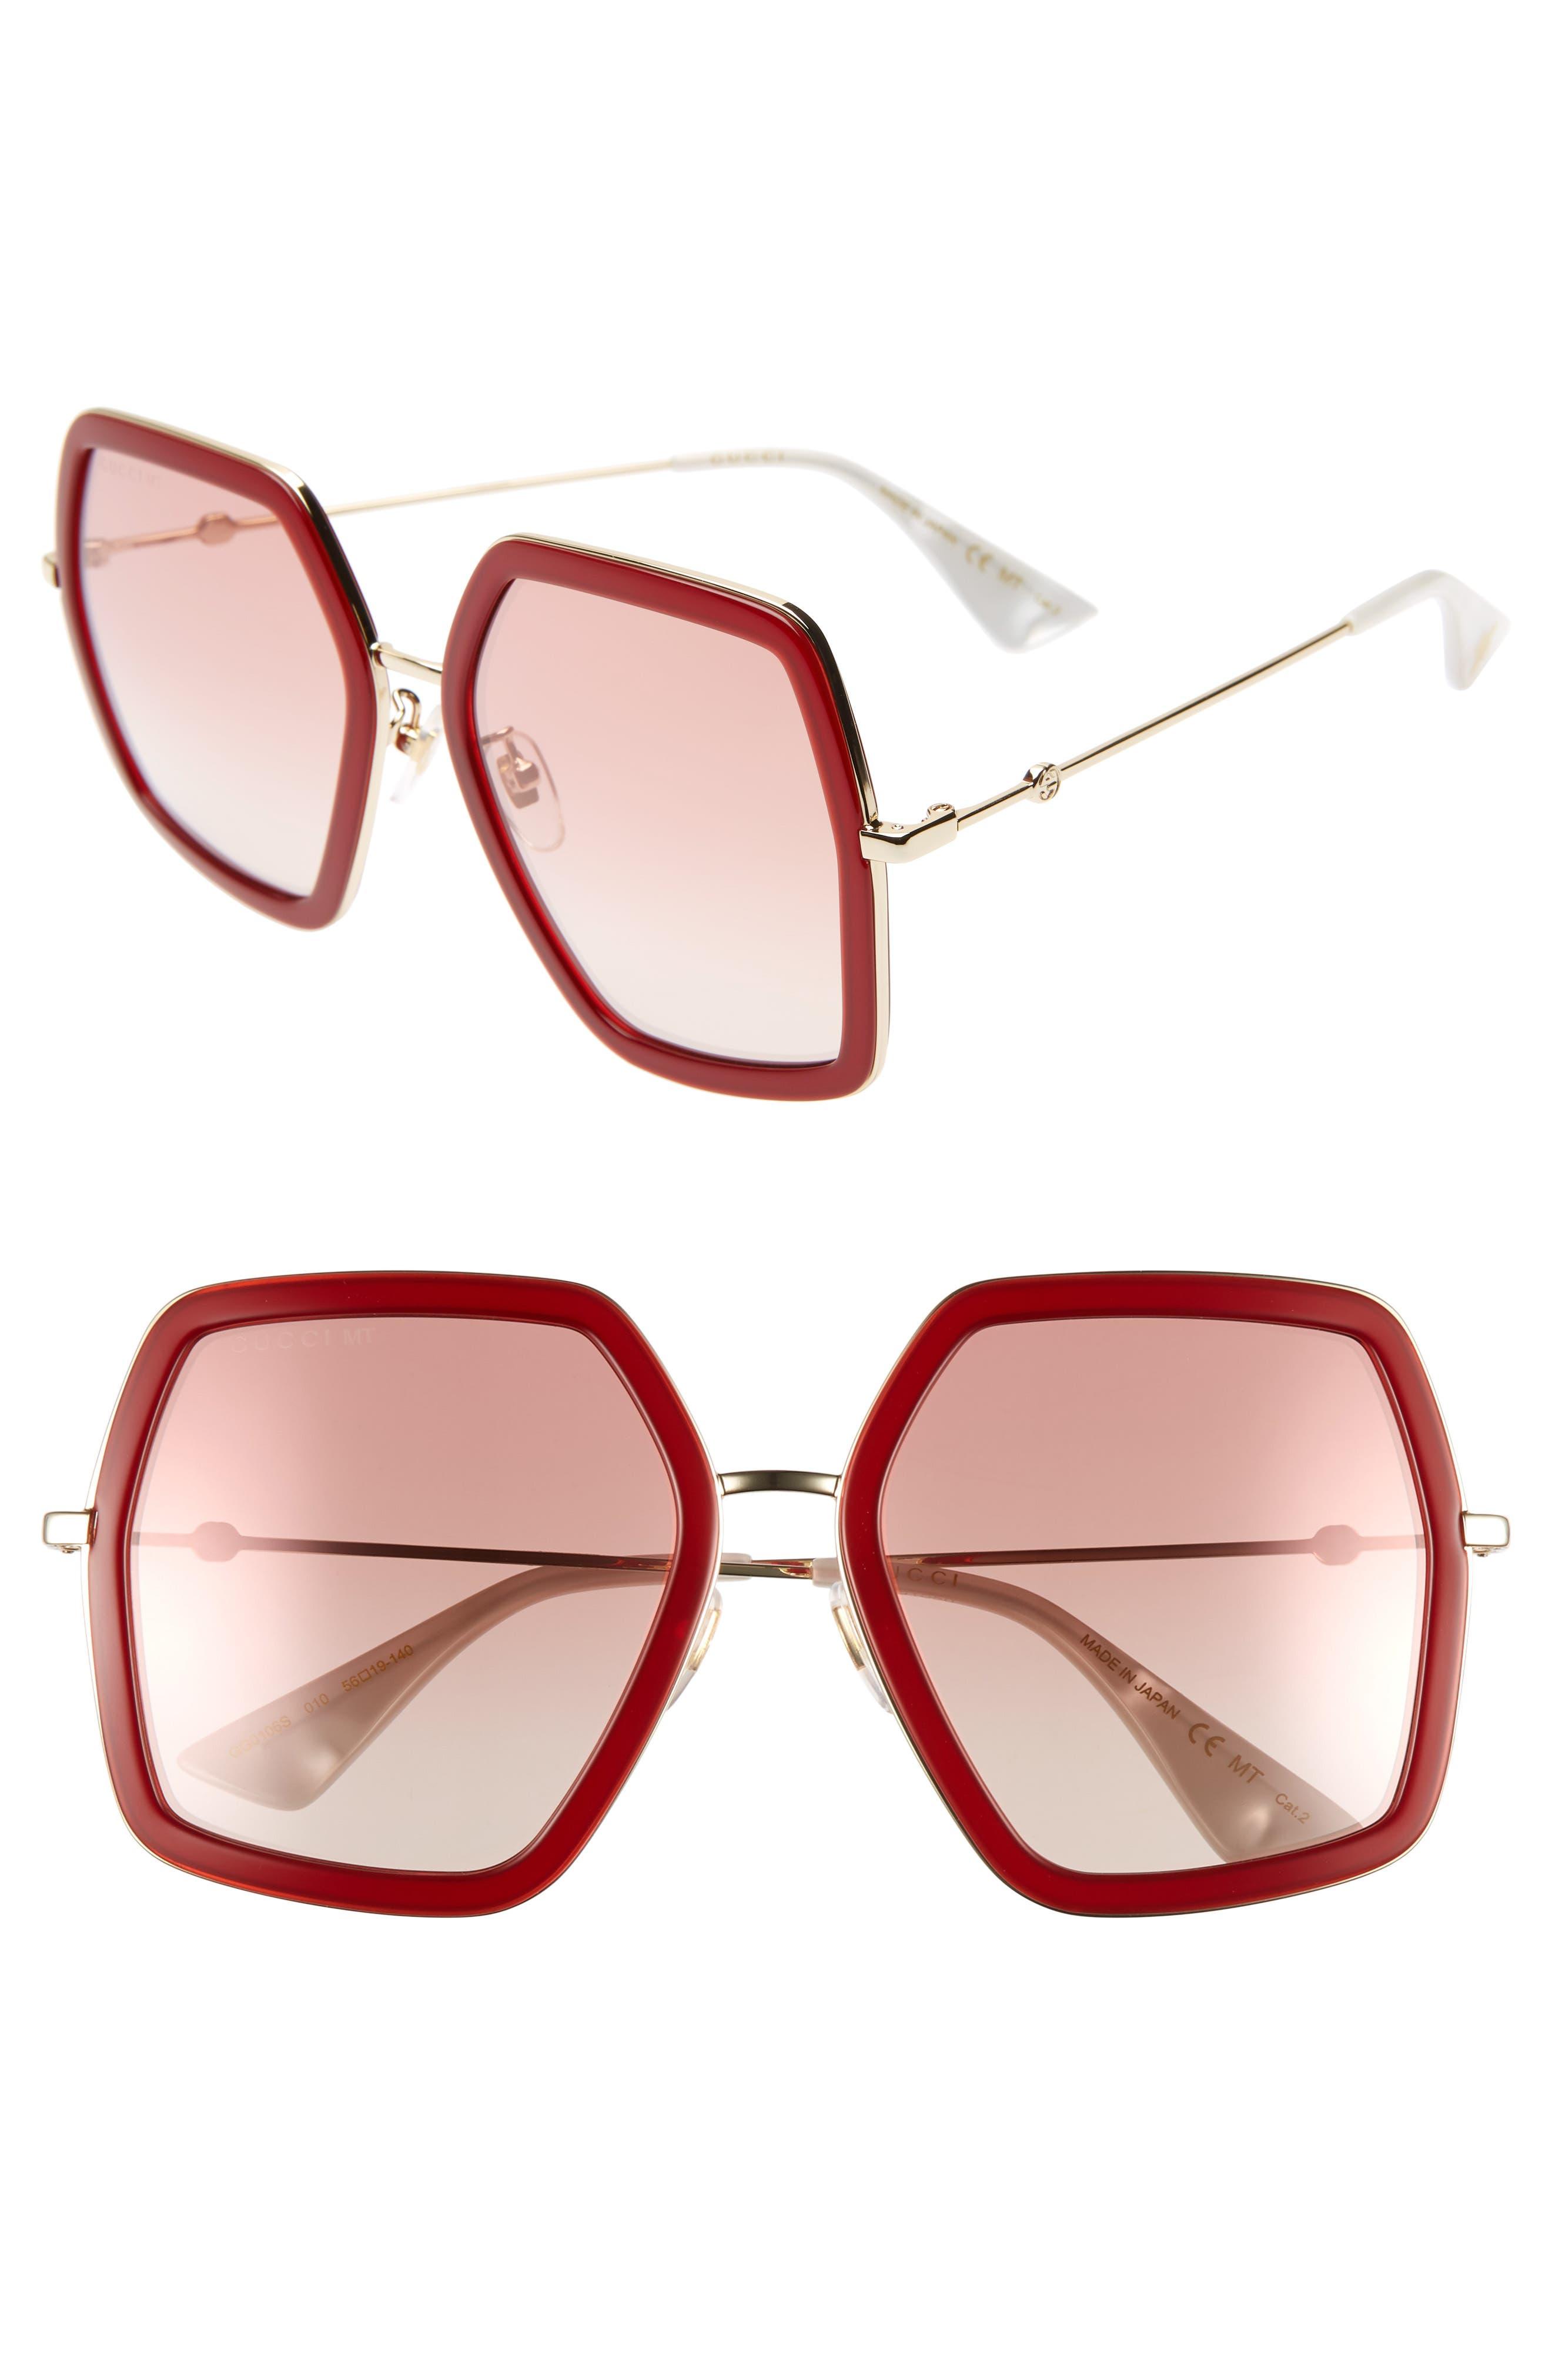 GUCCI, 56mm Sunglasses, Main thumbnail 1, color, SHINY ENDURA GLD/PK GRAD MIR